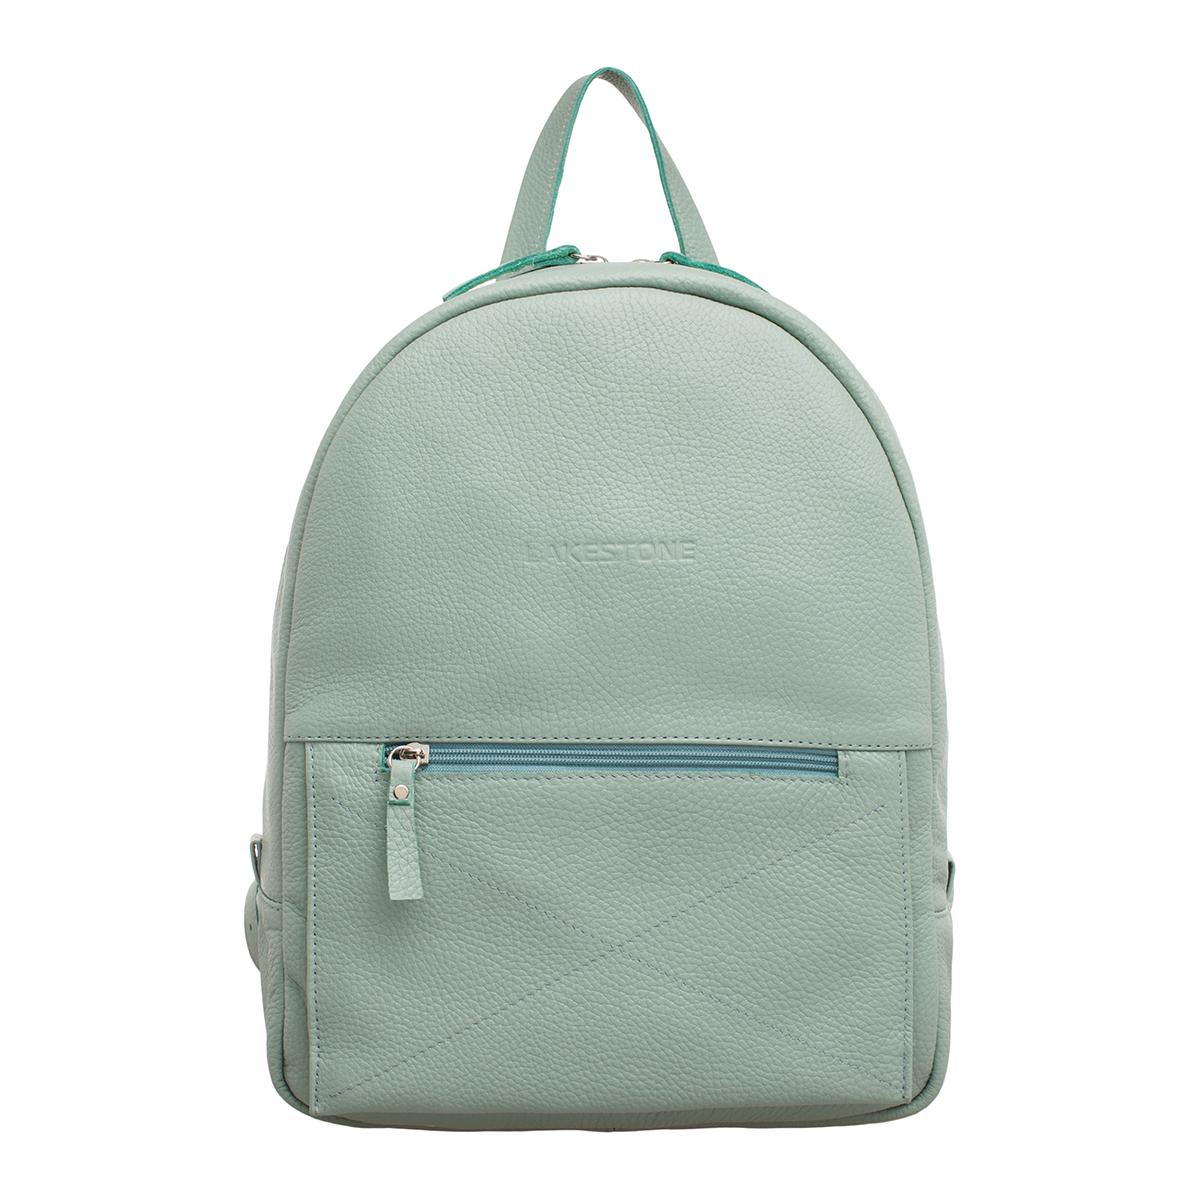 Рюкзак женский кожаный Lakestone 9123917/MG фото